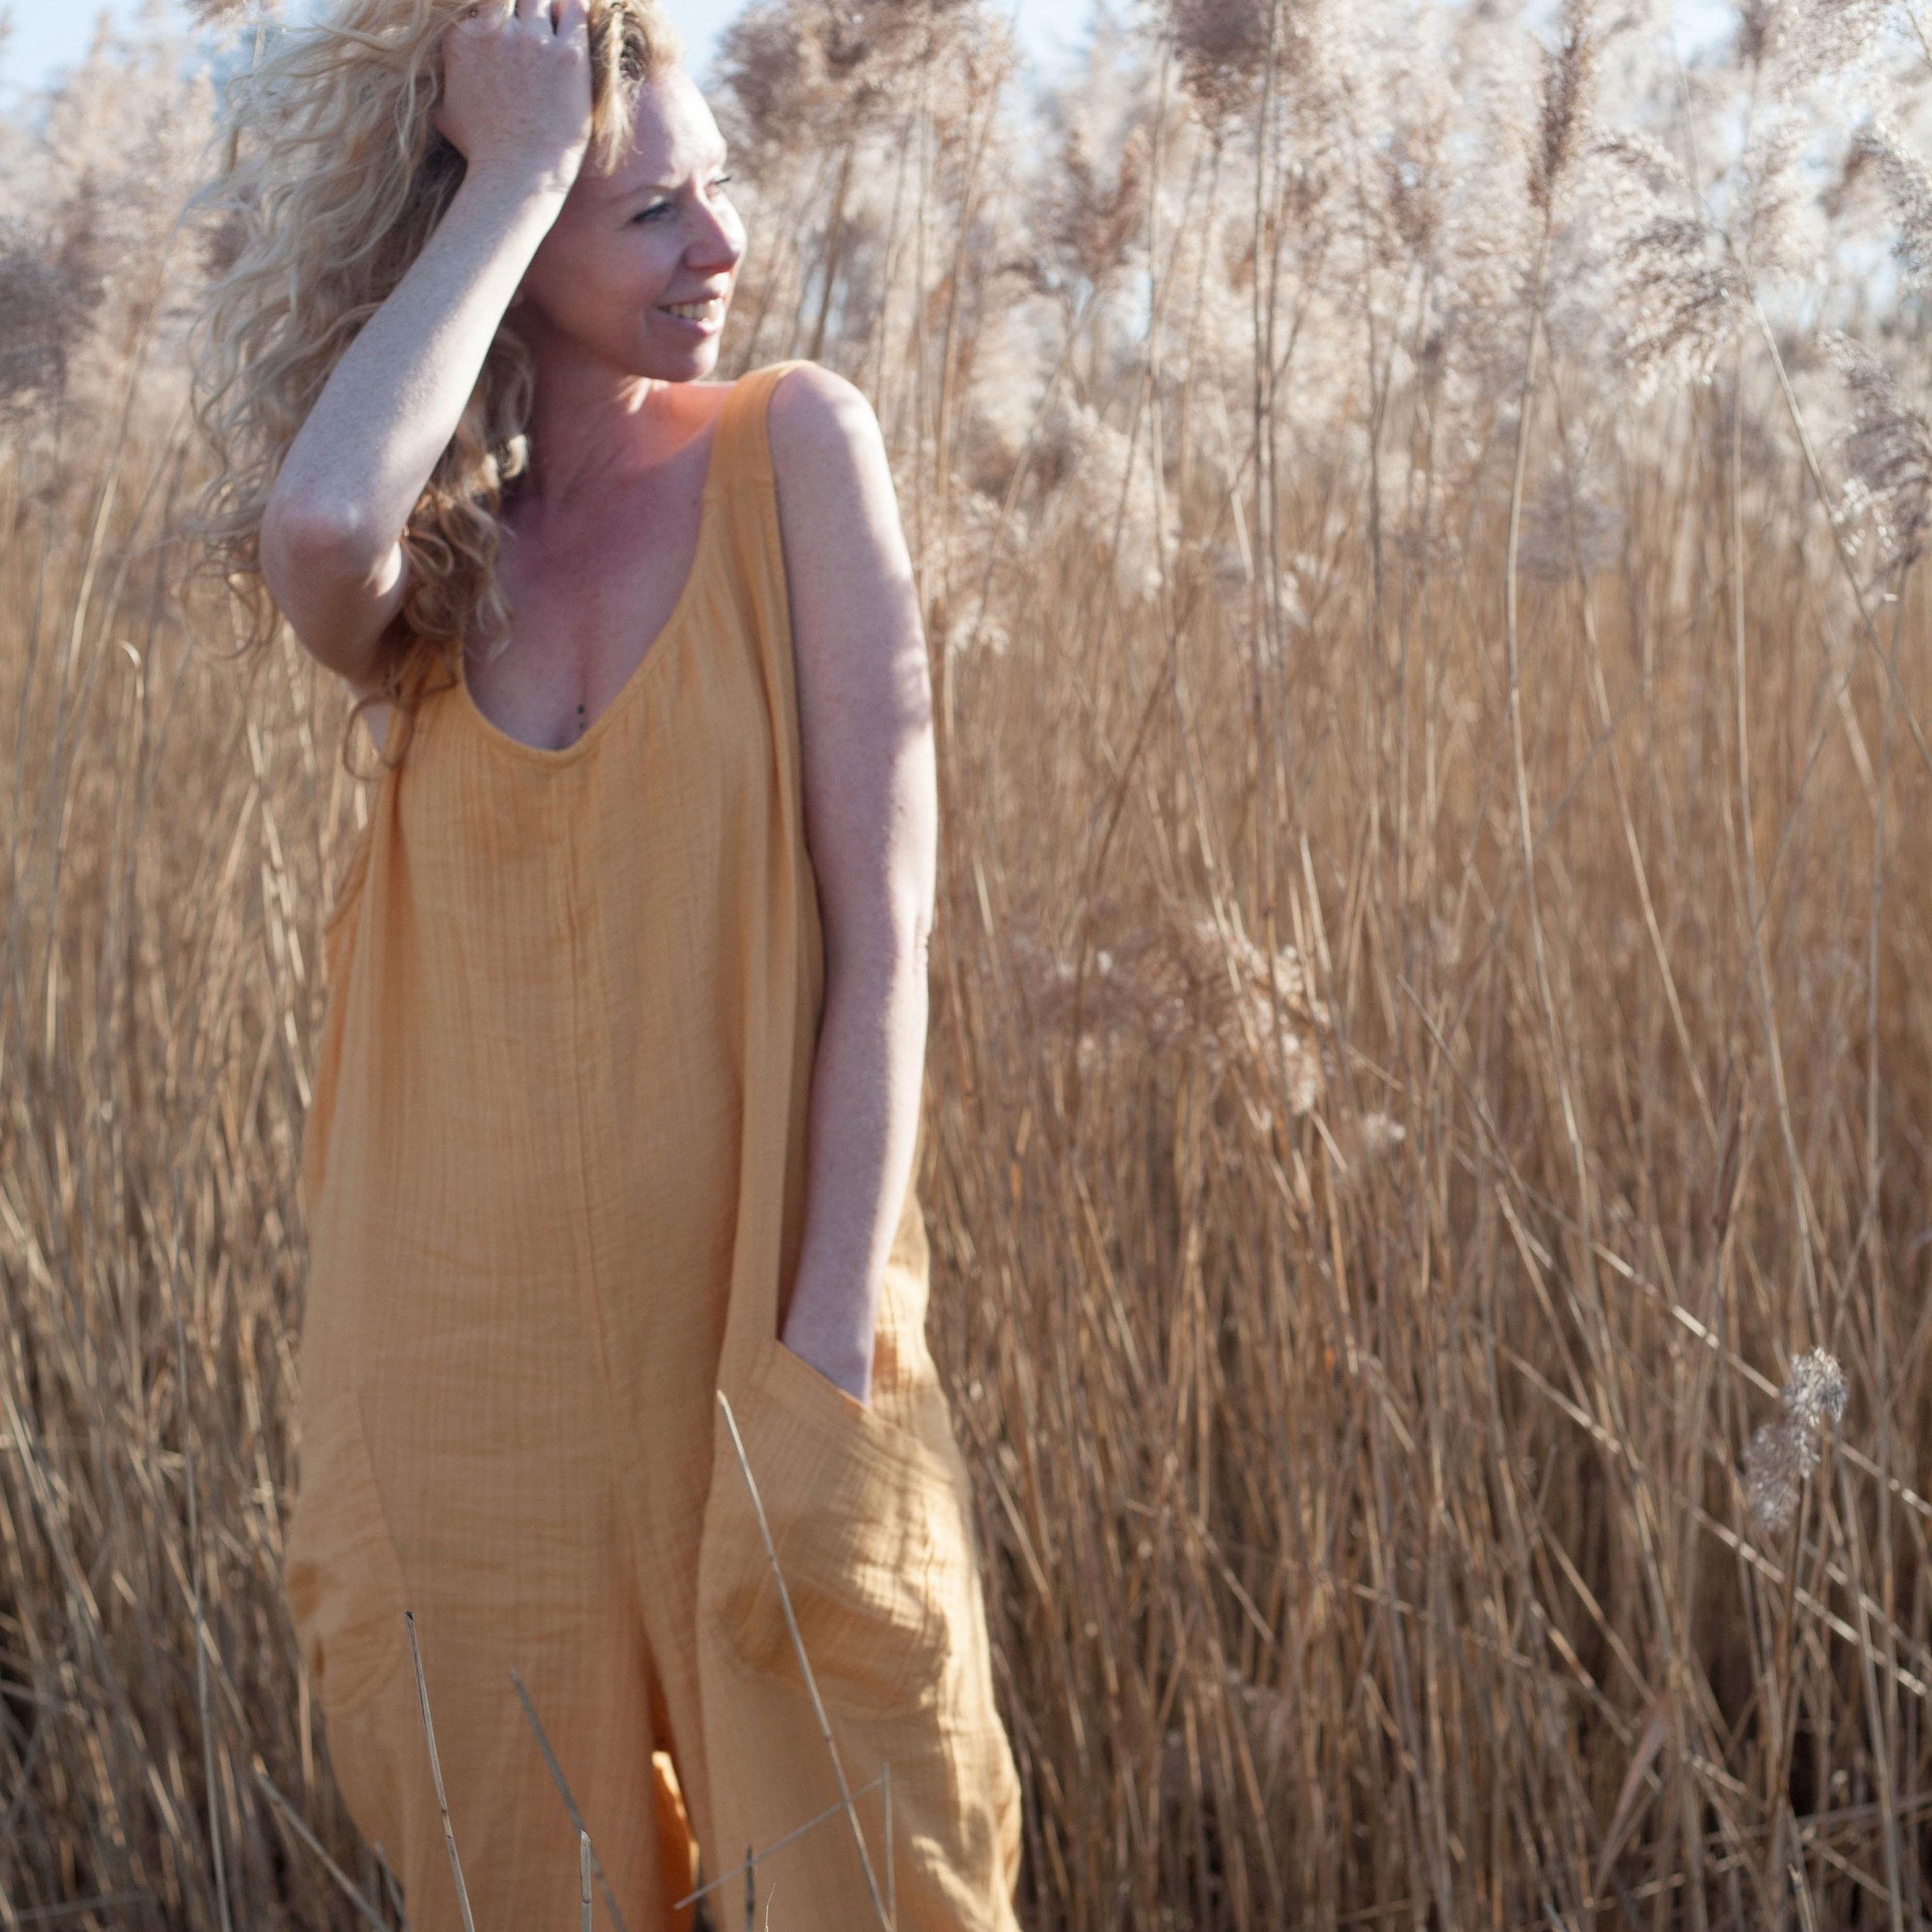 Wildling Woman